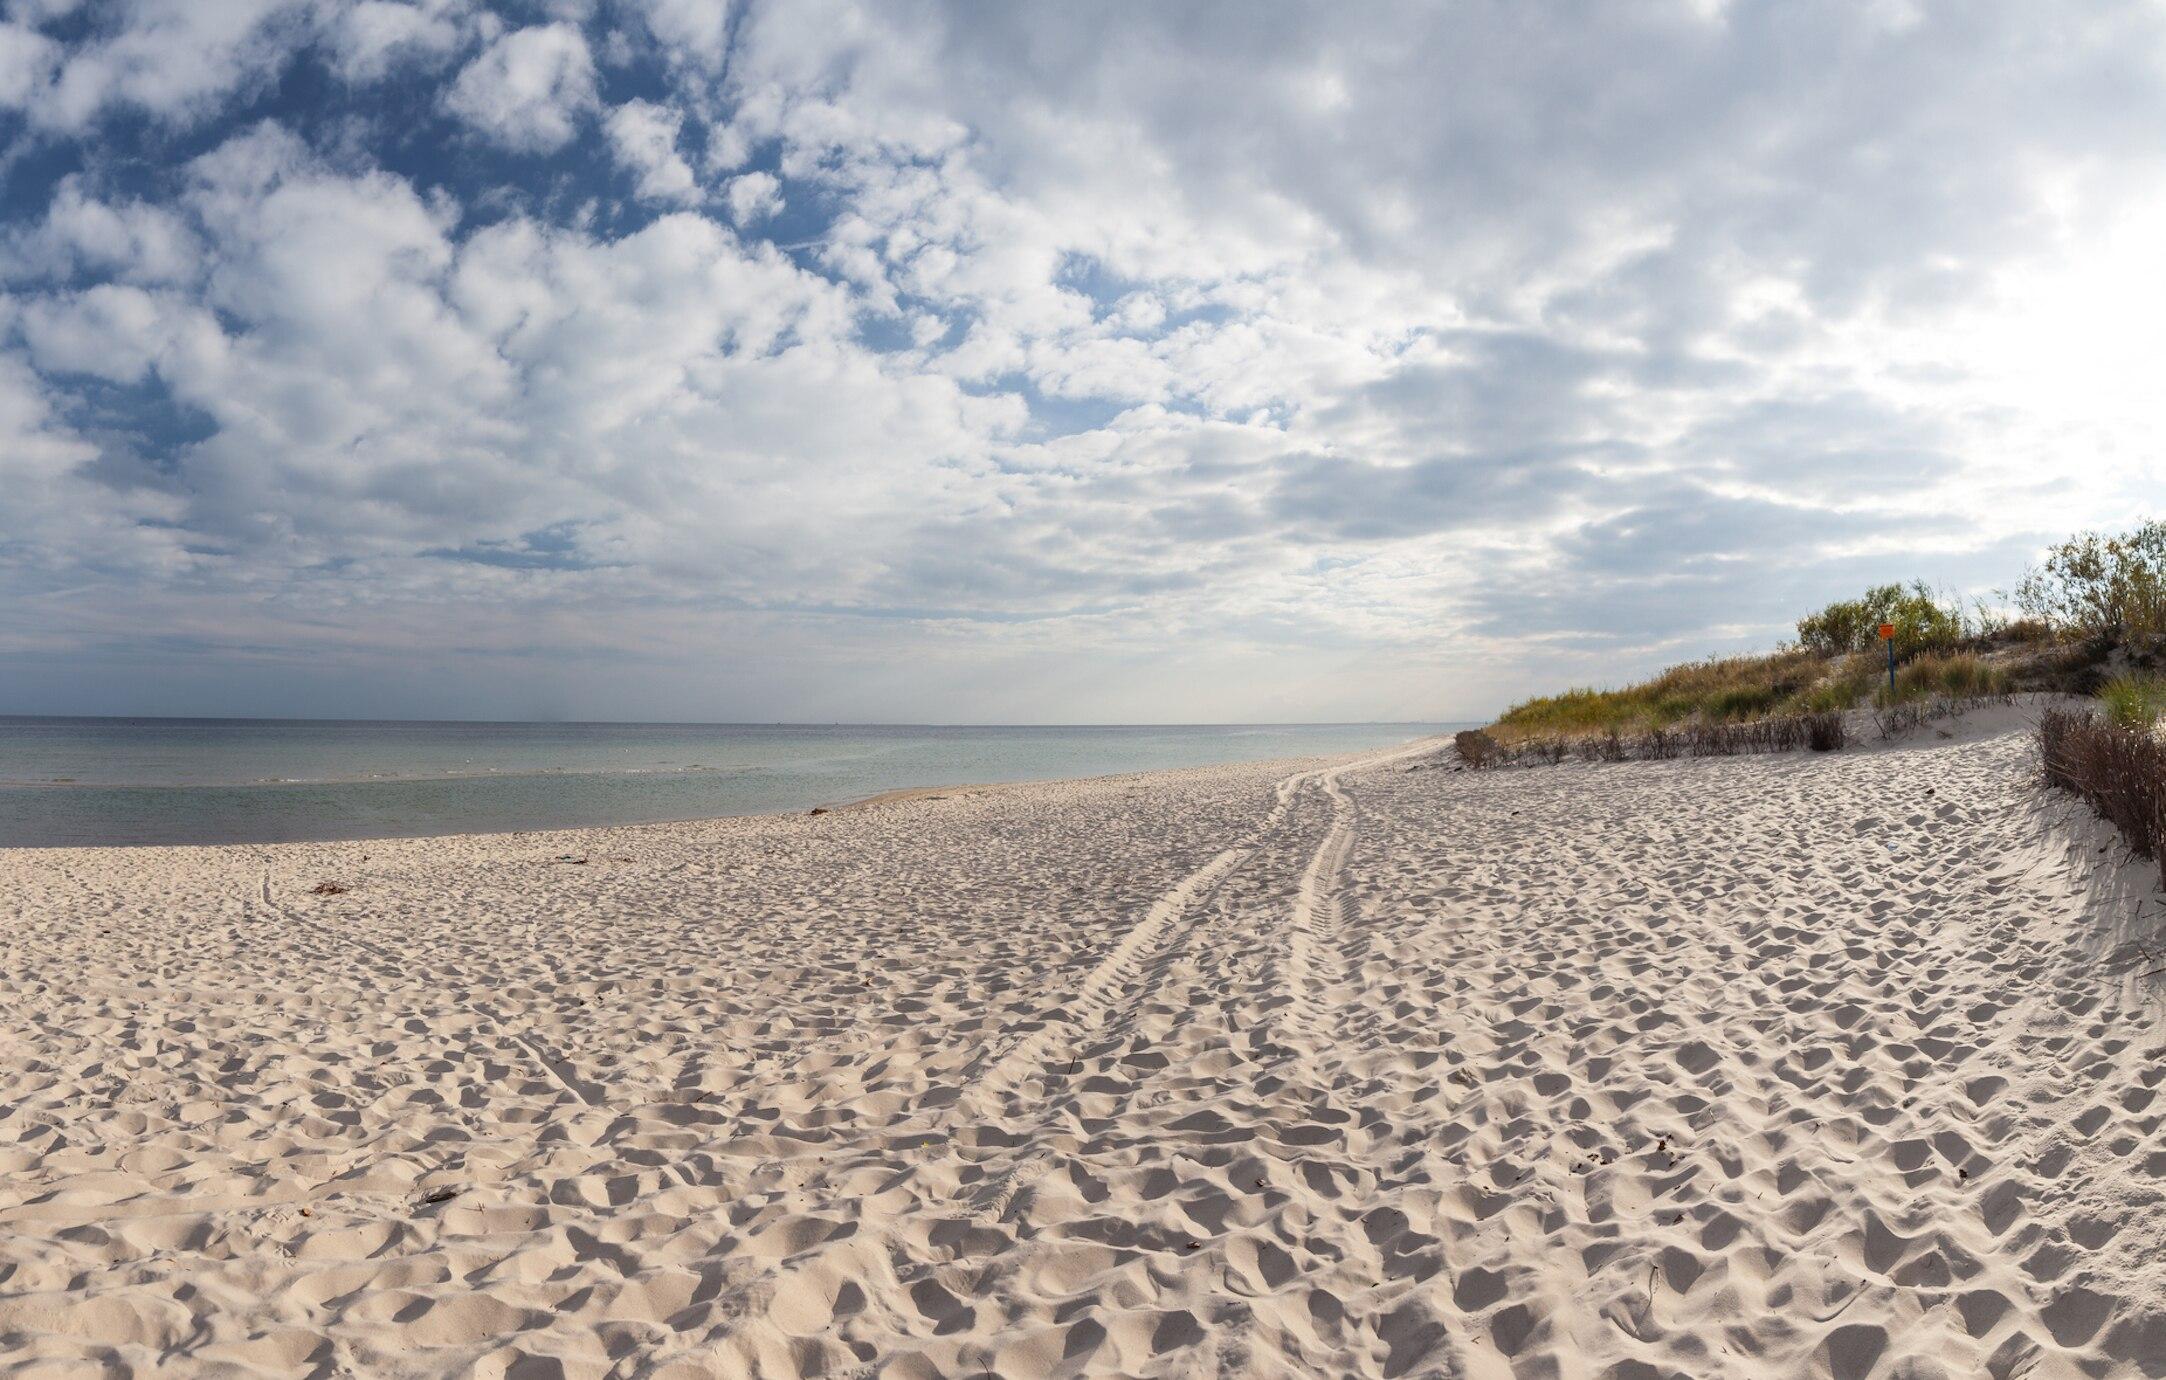 Die besten Tipps die schöne Halbinsel Hel an Polens Ostseeküste